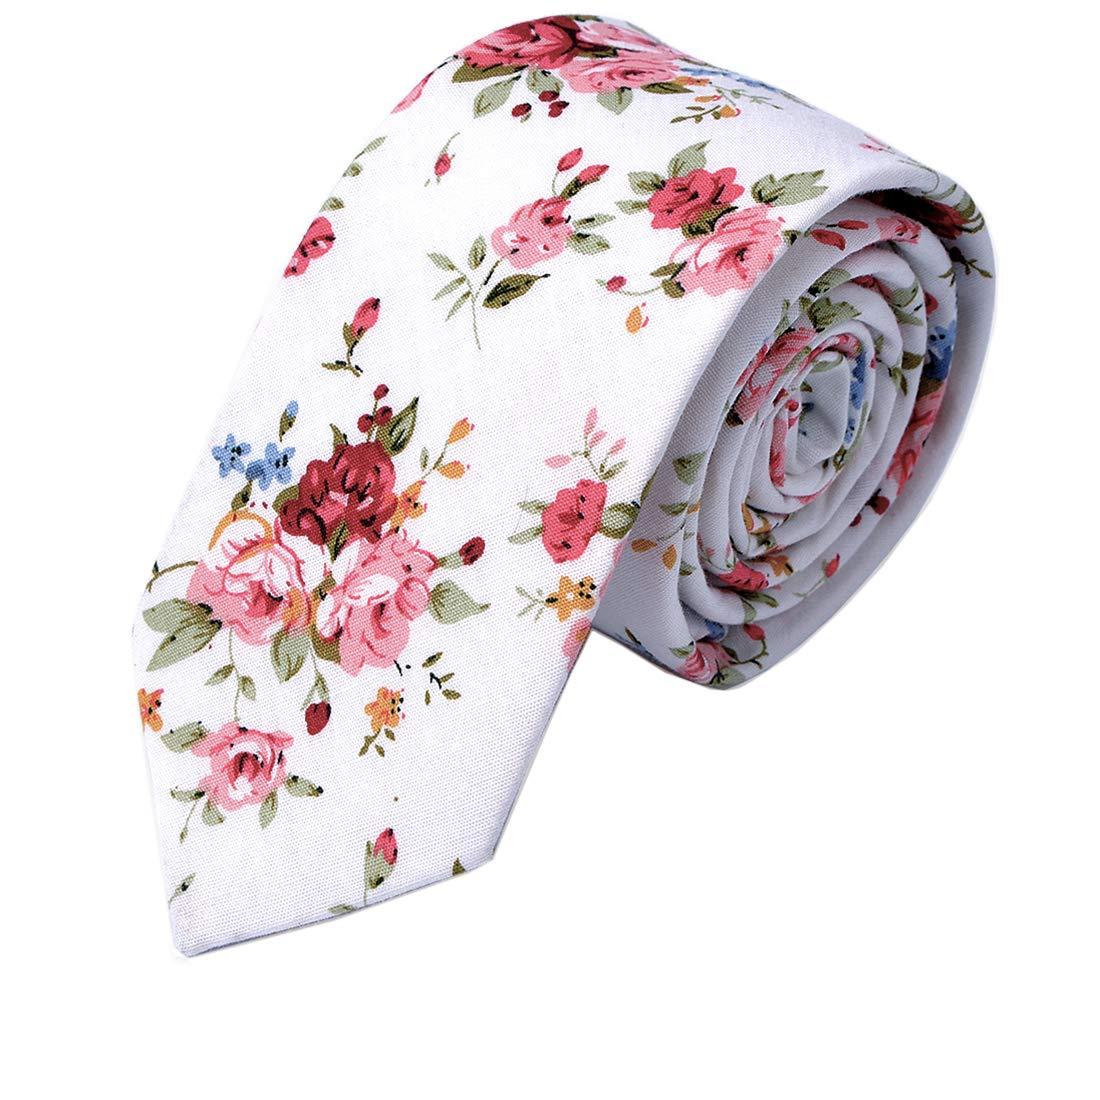 JESLANG Men's Cotton Printed Floral Neck Tie 2.56'' Narrow Ties Various Designs